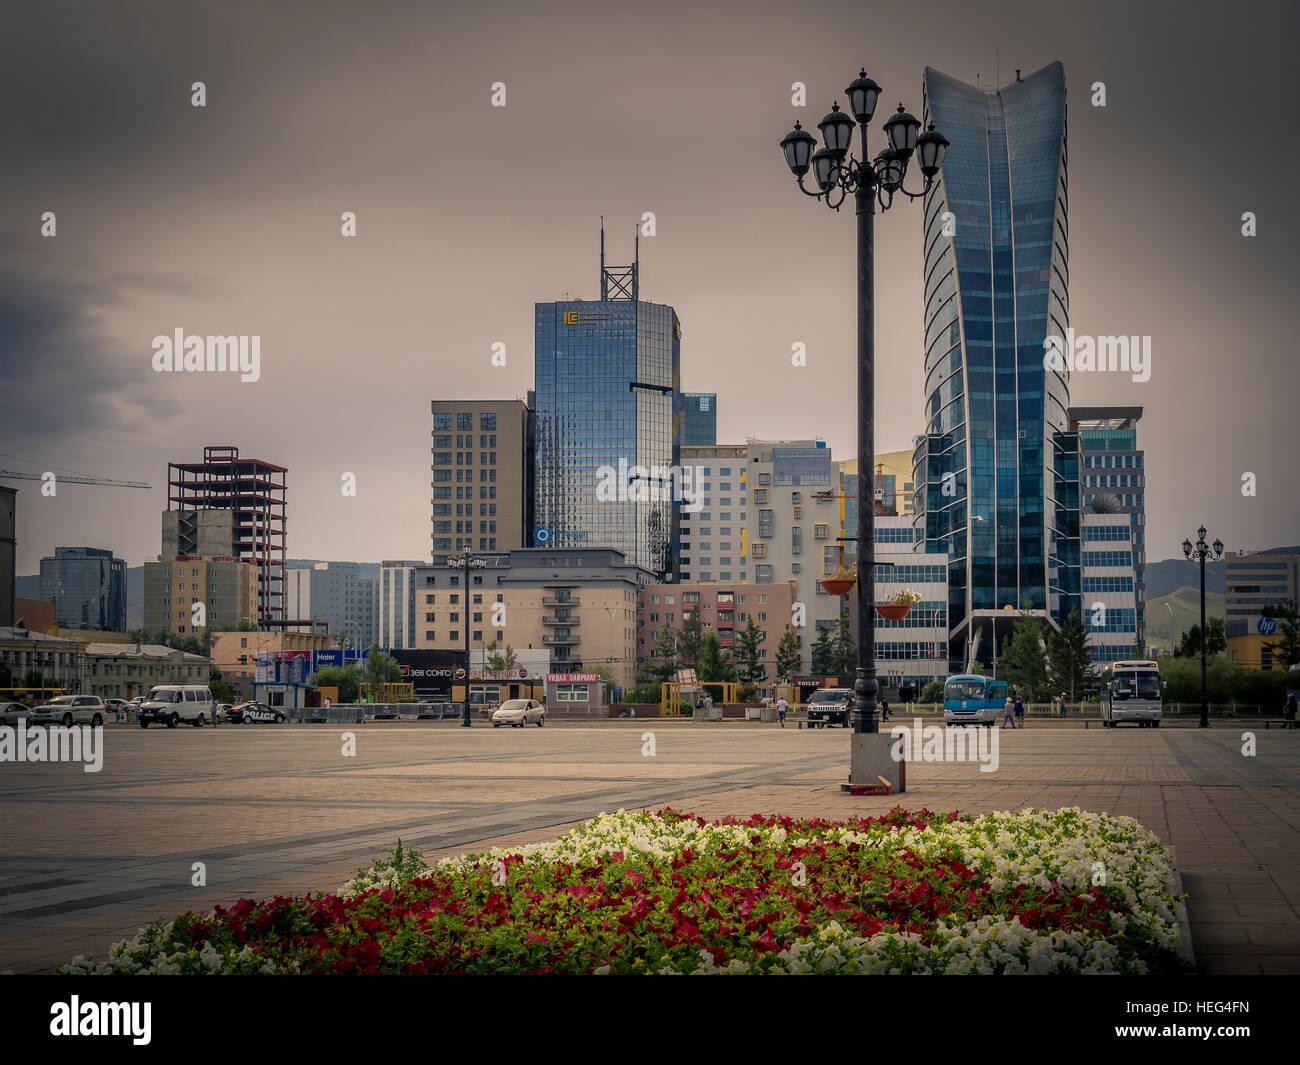 Chinggis Square with Blue Sky Tower, Ulaanbaatar, Mongolia Stock Photo